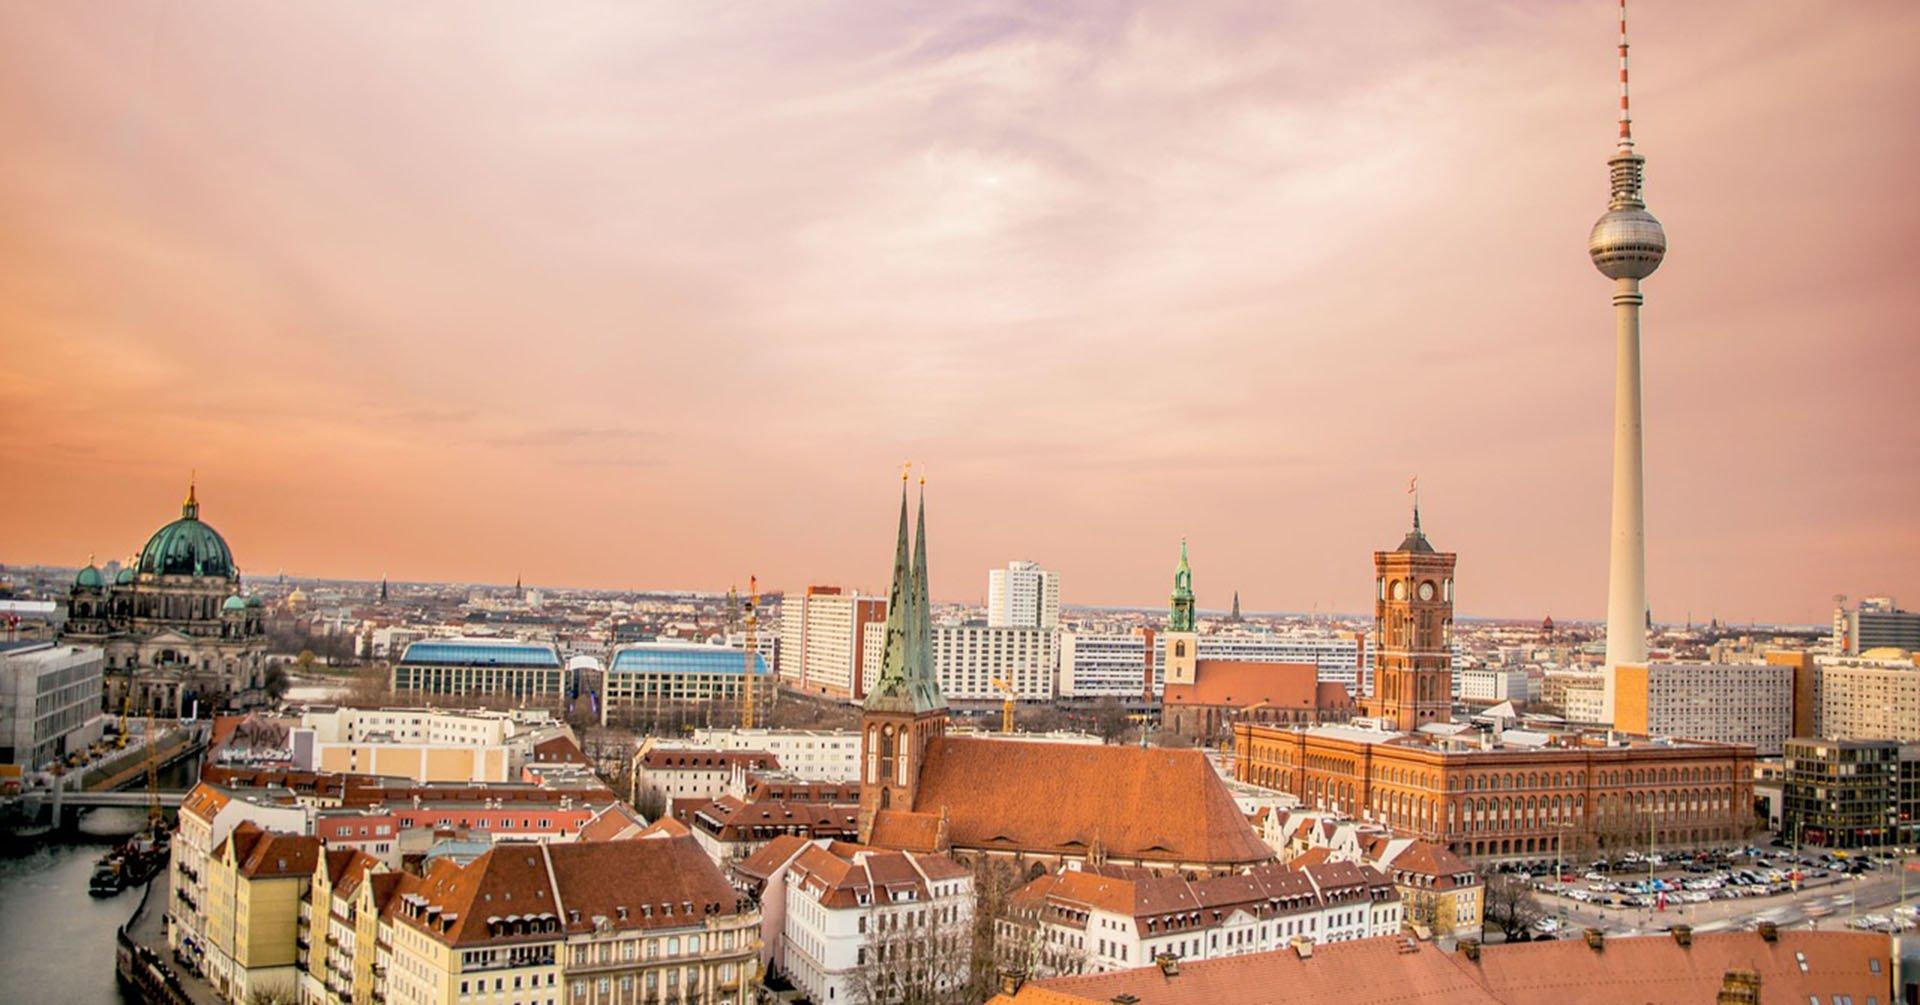 Berlin skyline during sunrise - Alternative sightseeing tours in Berlin